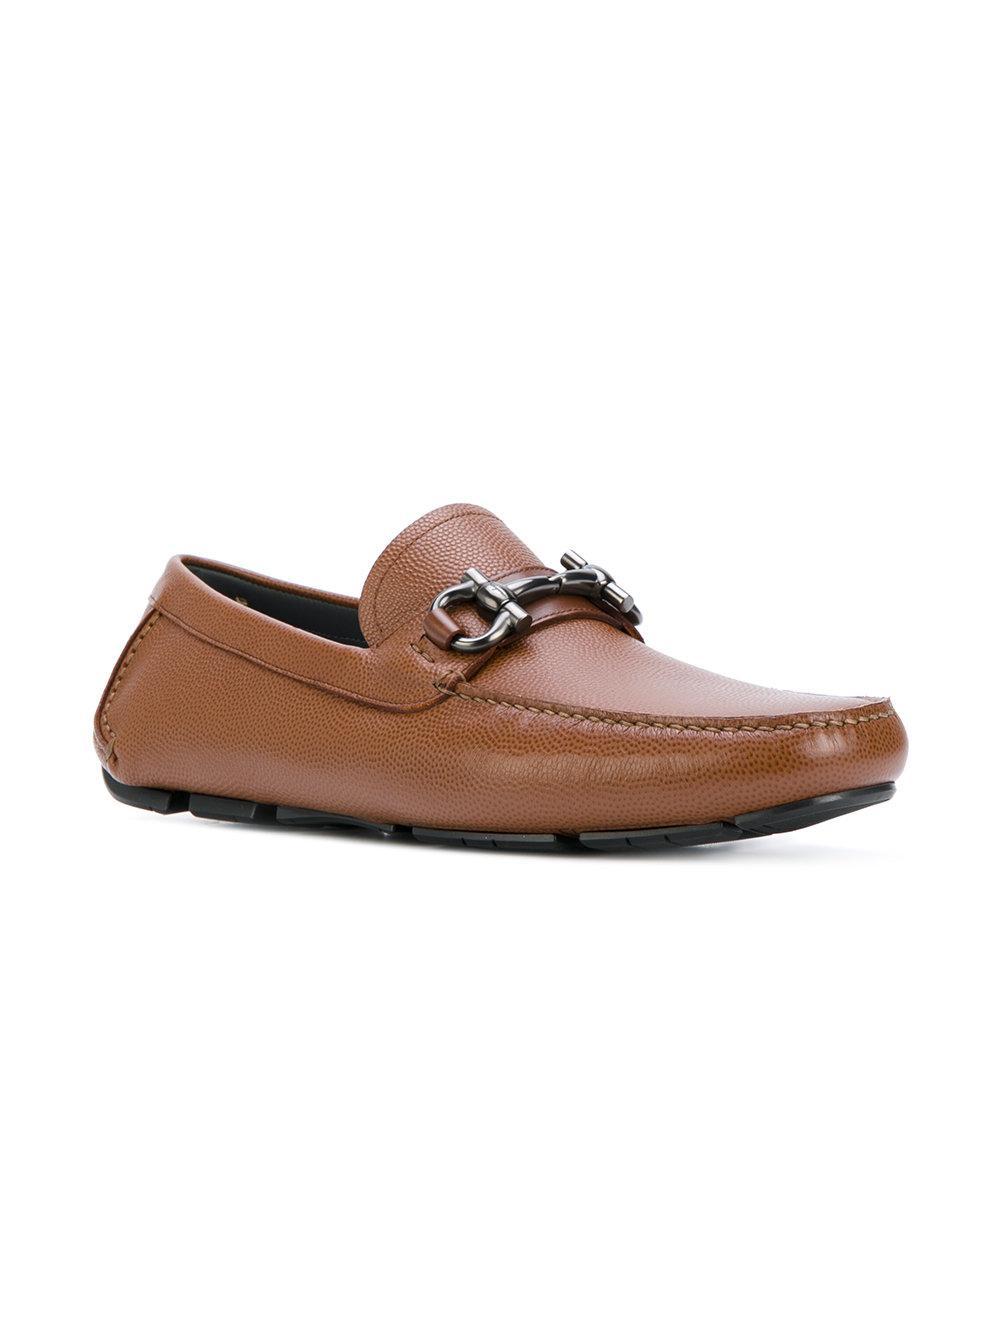 f928f884984b4 Ferragamo Parigi Loafers in Brown for Men - Lyst